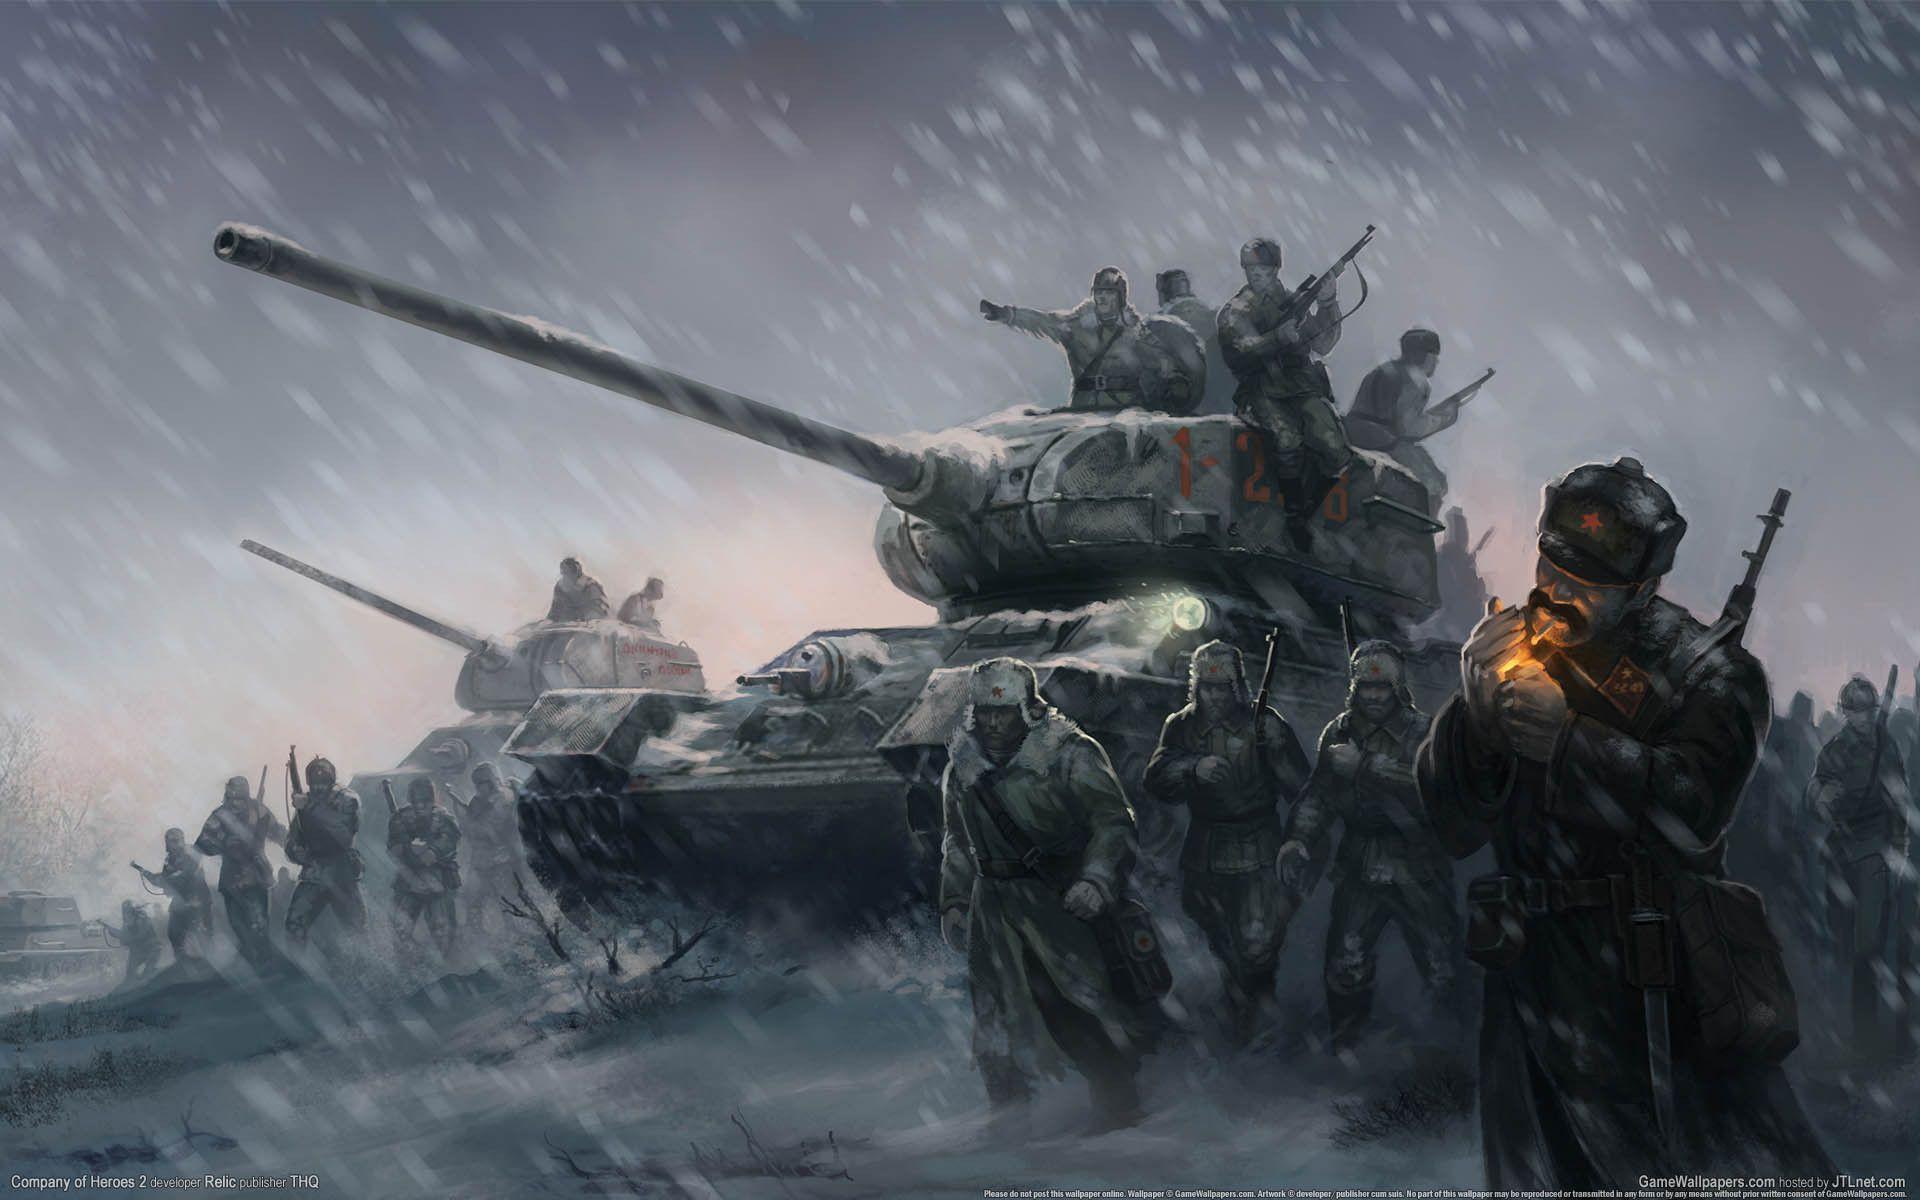 Skachat Oboi Vtoraya Mirovaya Vojna Game Wallpapers Soldiers